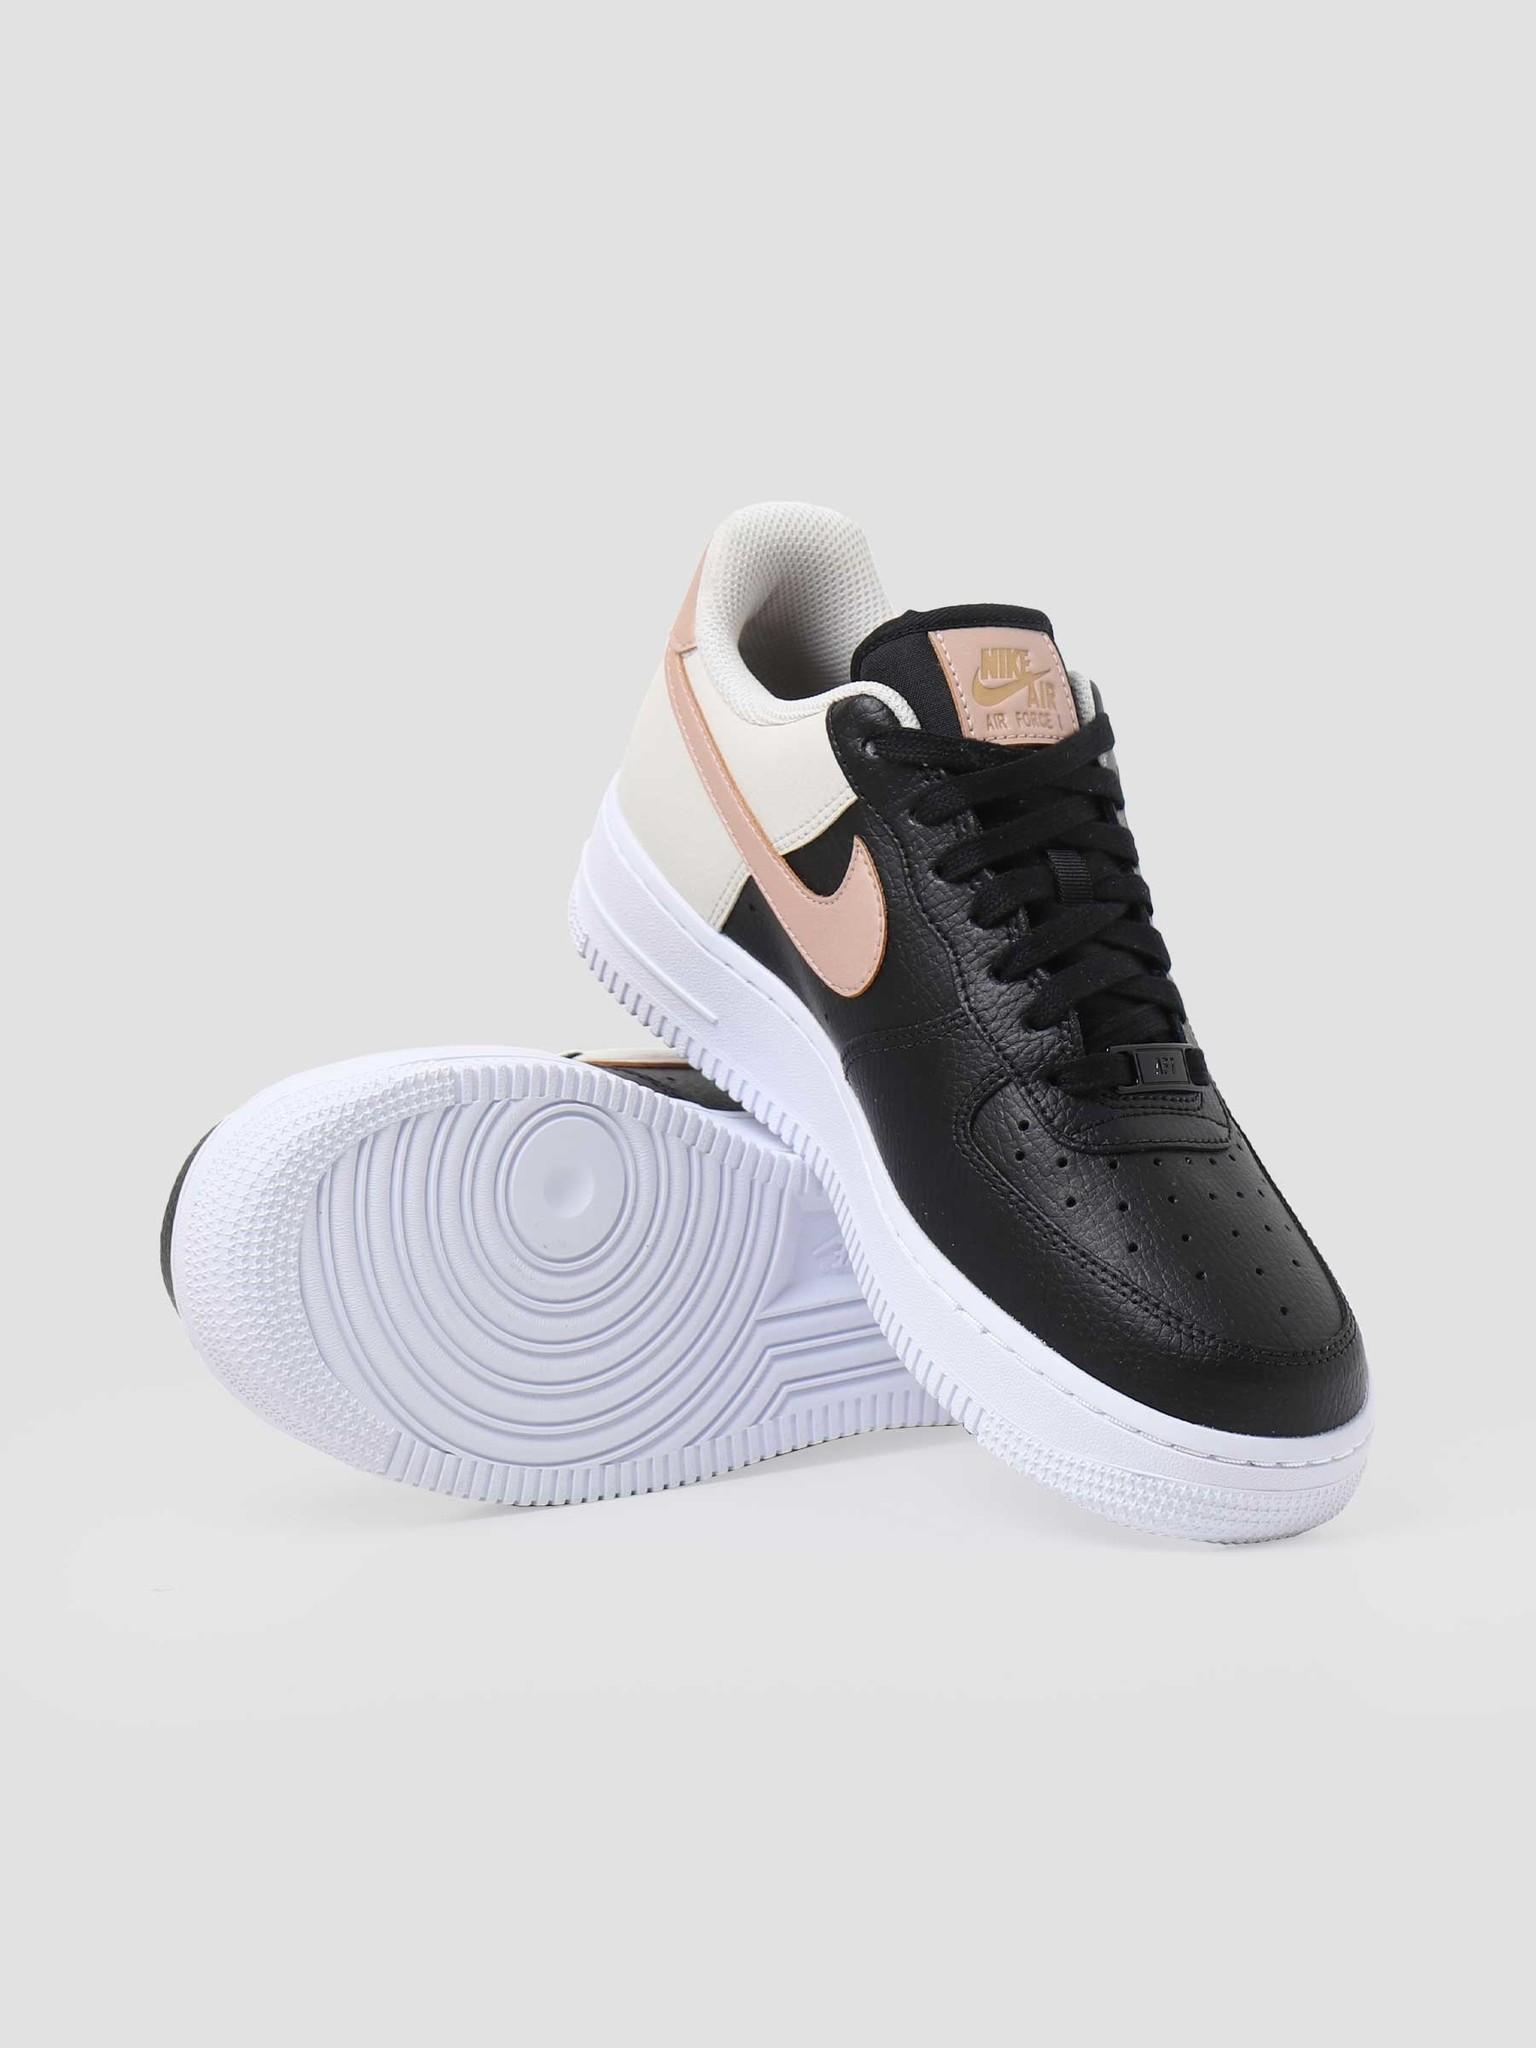 Nike Nike W Air Force 1 07 Black Mtlc Red Bronze Lt Orewood Brn CU5311-001